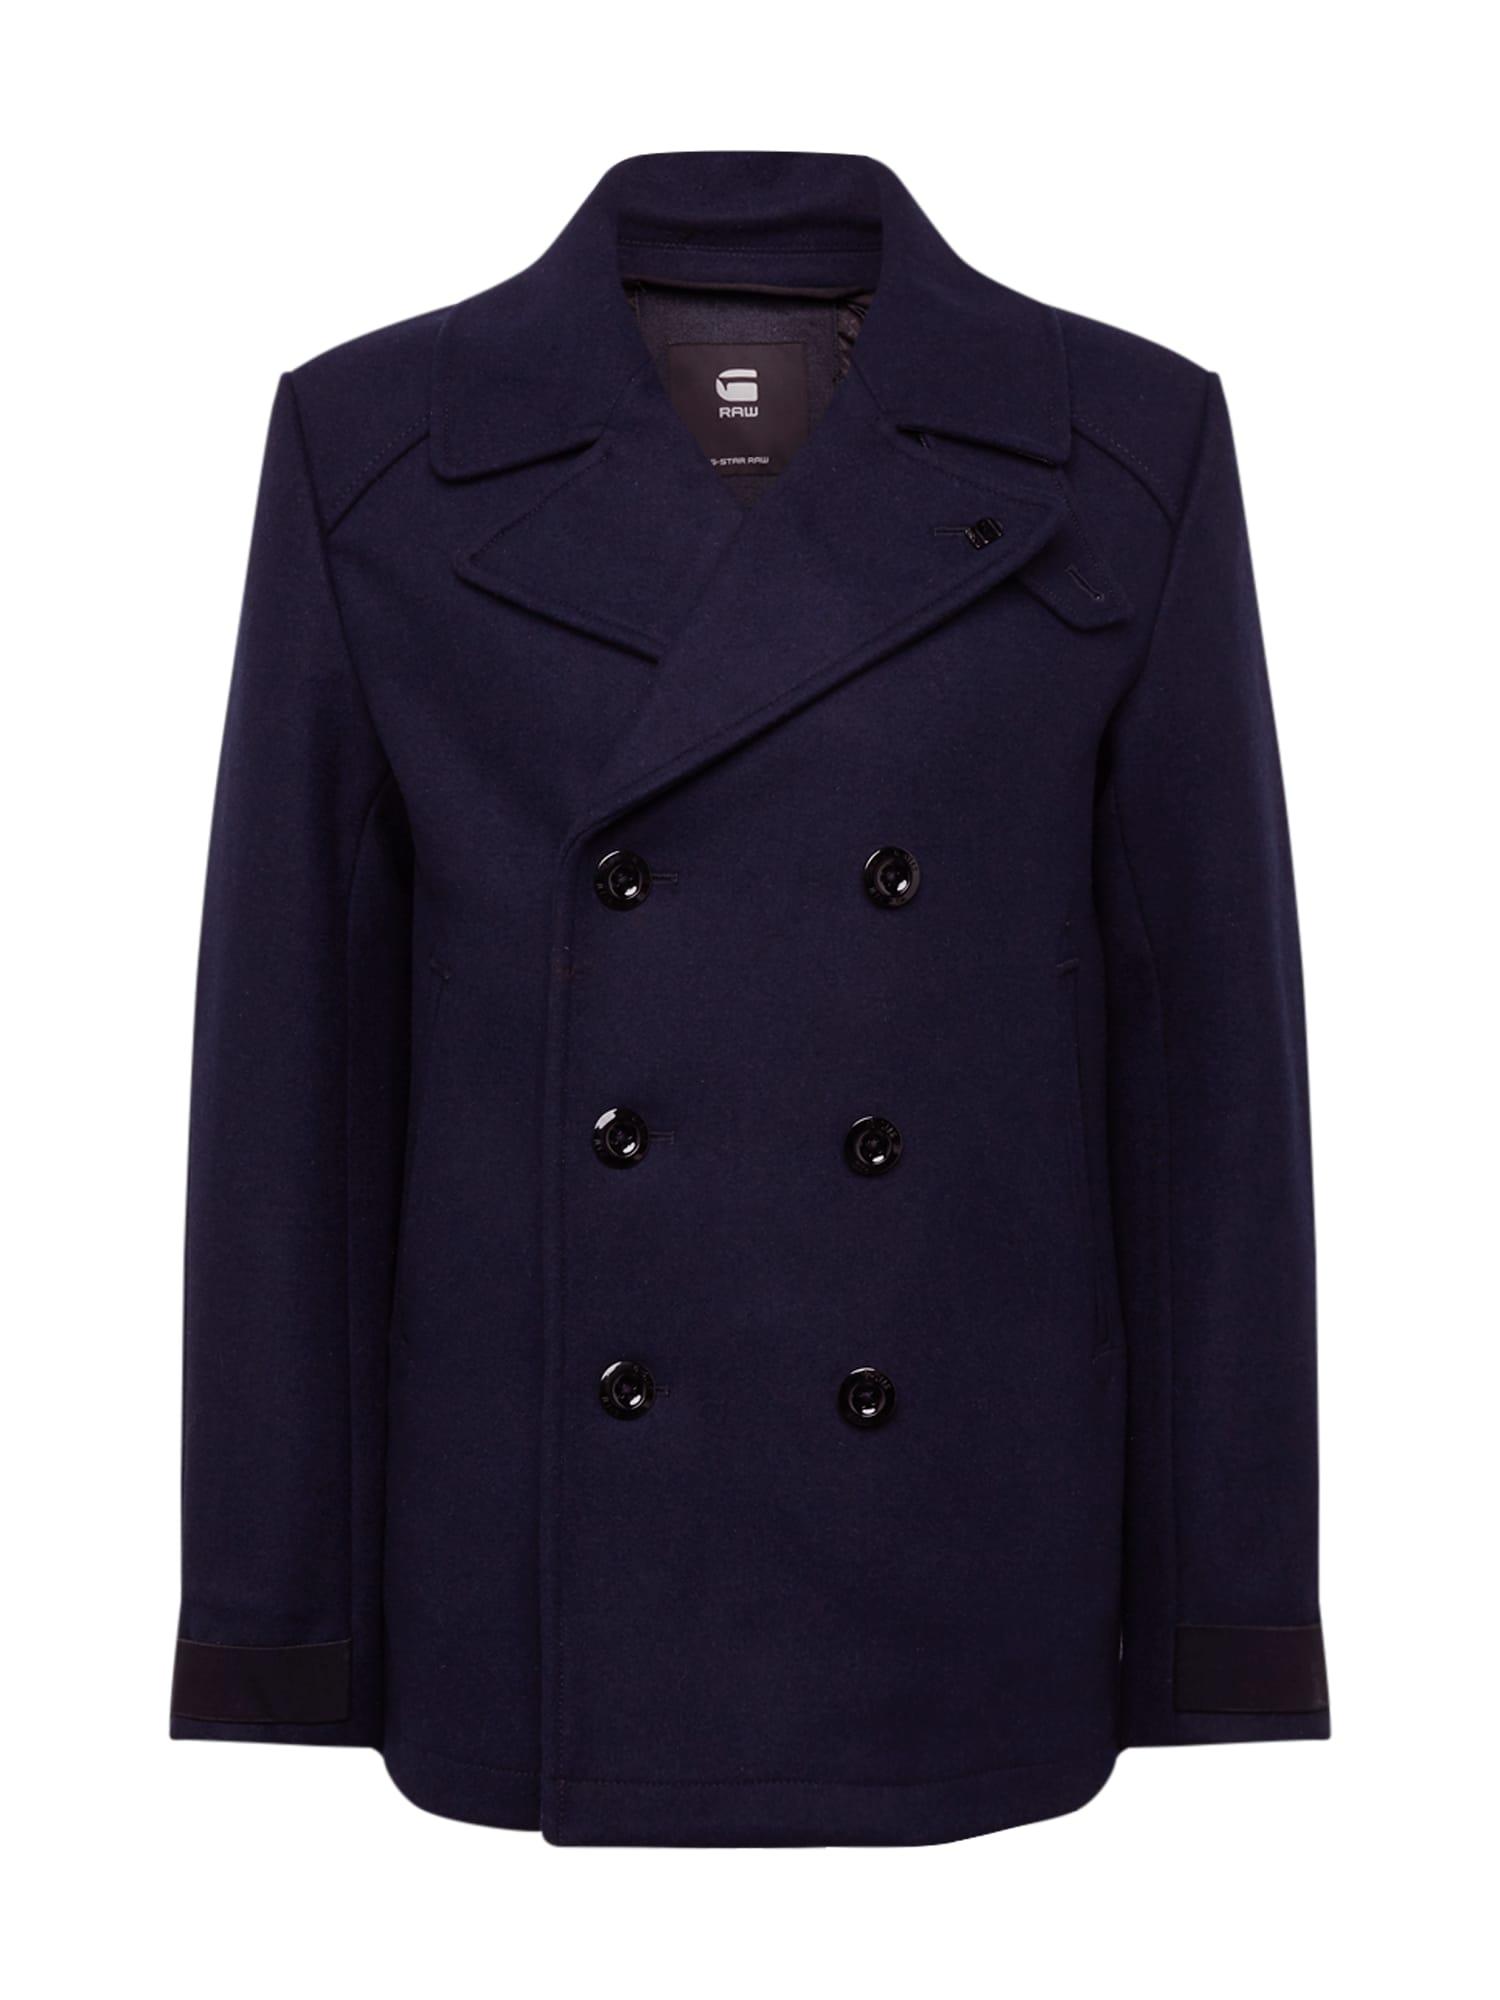 G-Star RAW Rudeninis-žieminis paltas 'Traction wool peacoat' tamsiai mėlyna